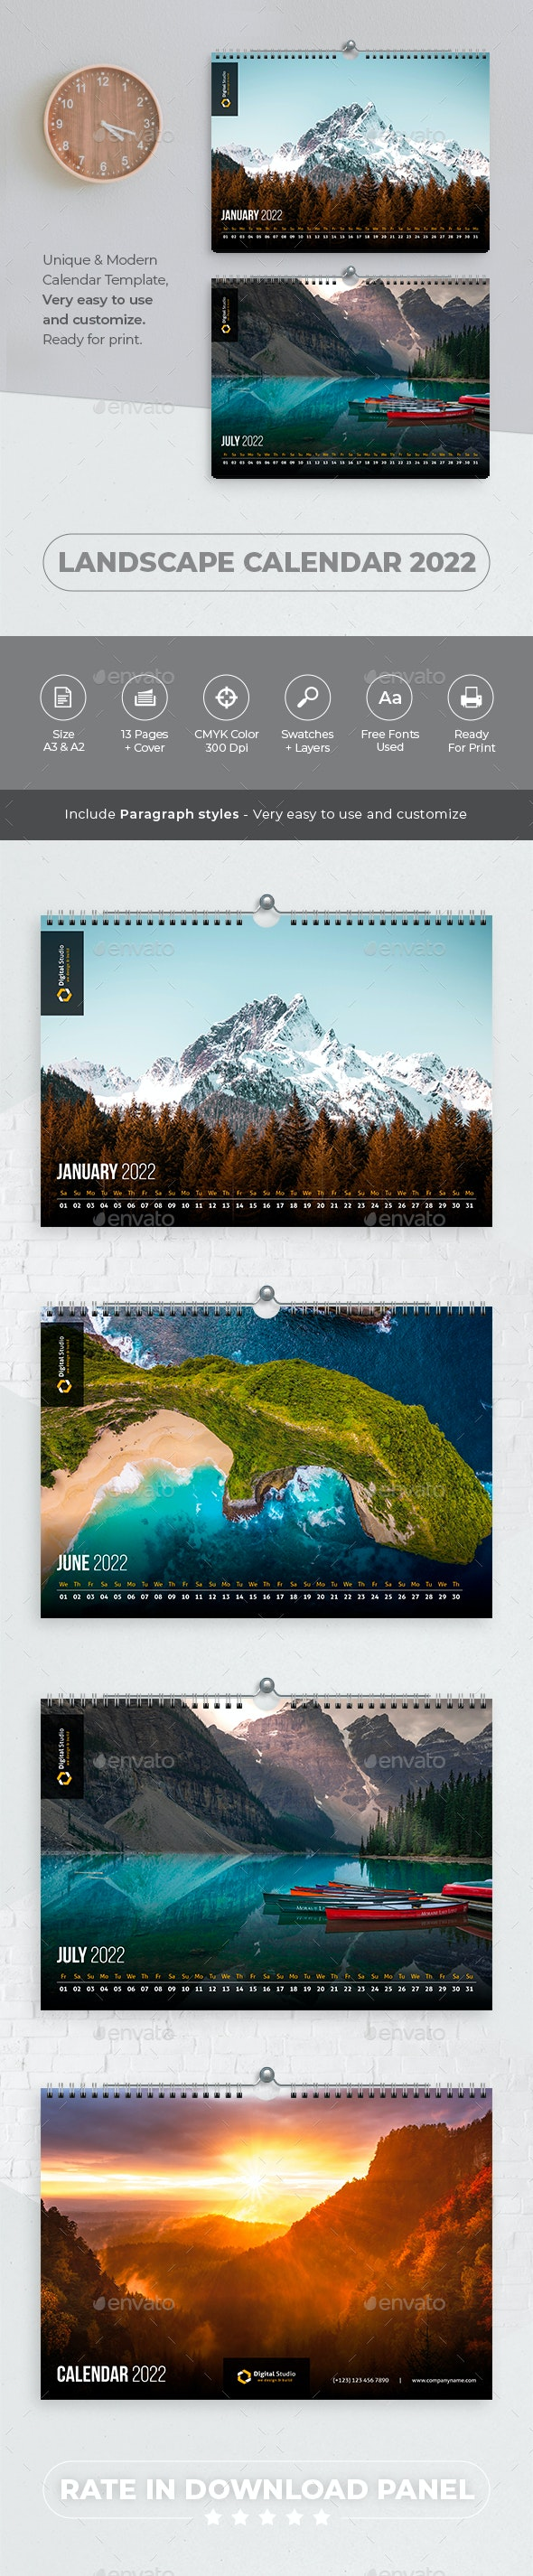 Landscape Calendar 2022 - Calendars Stationery